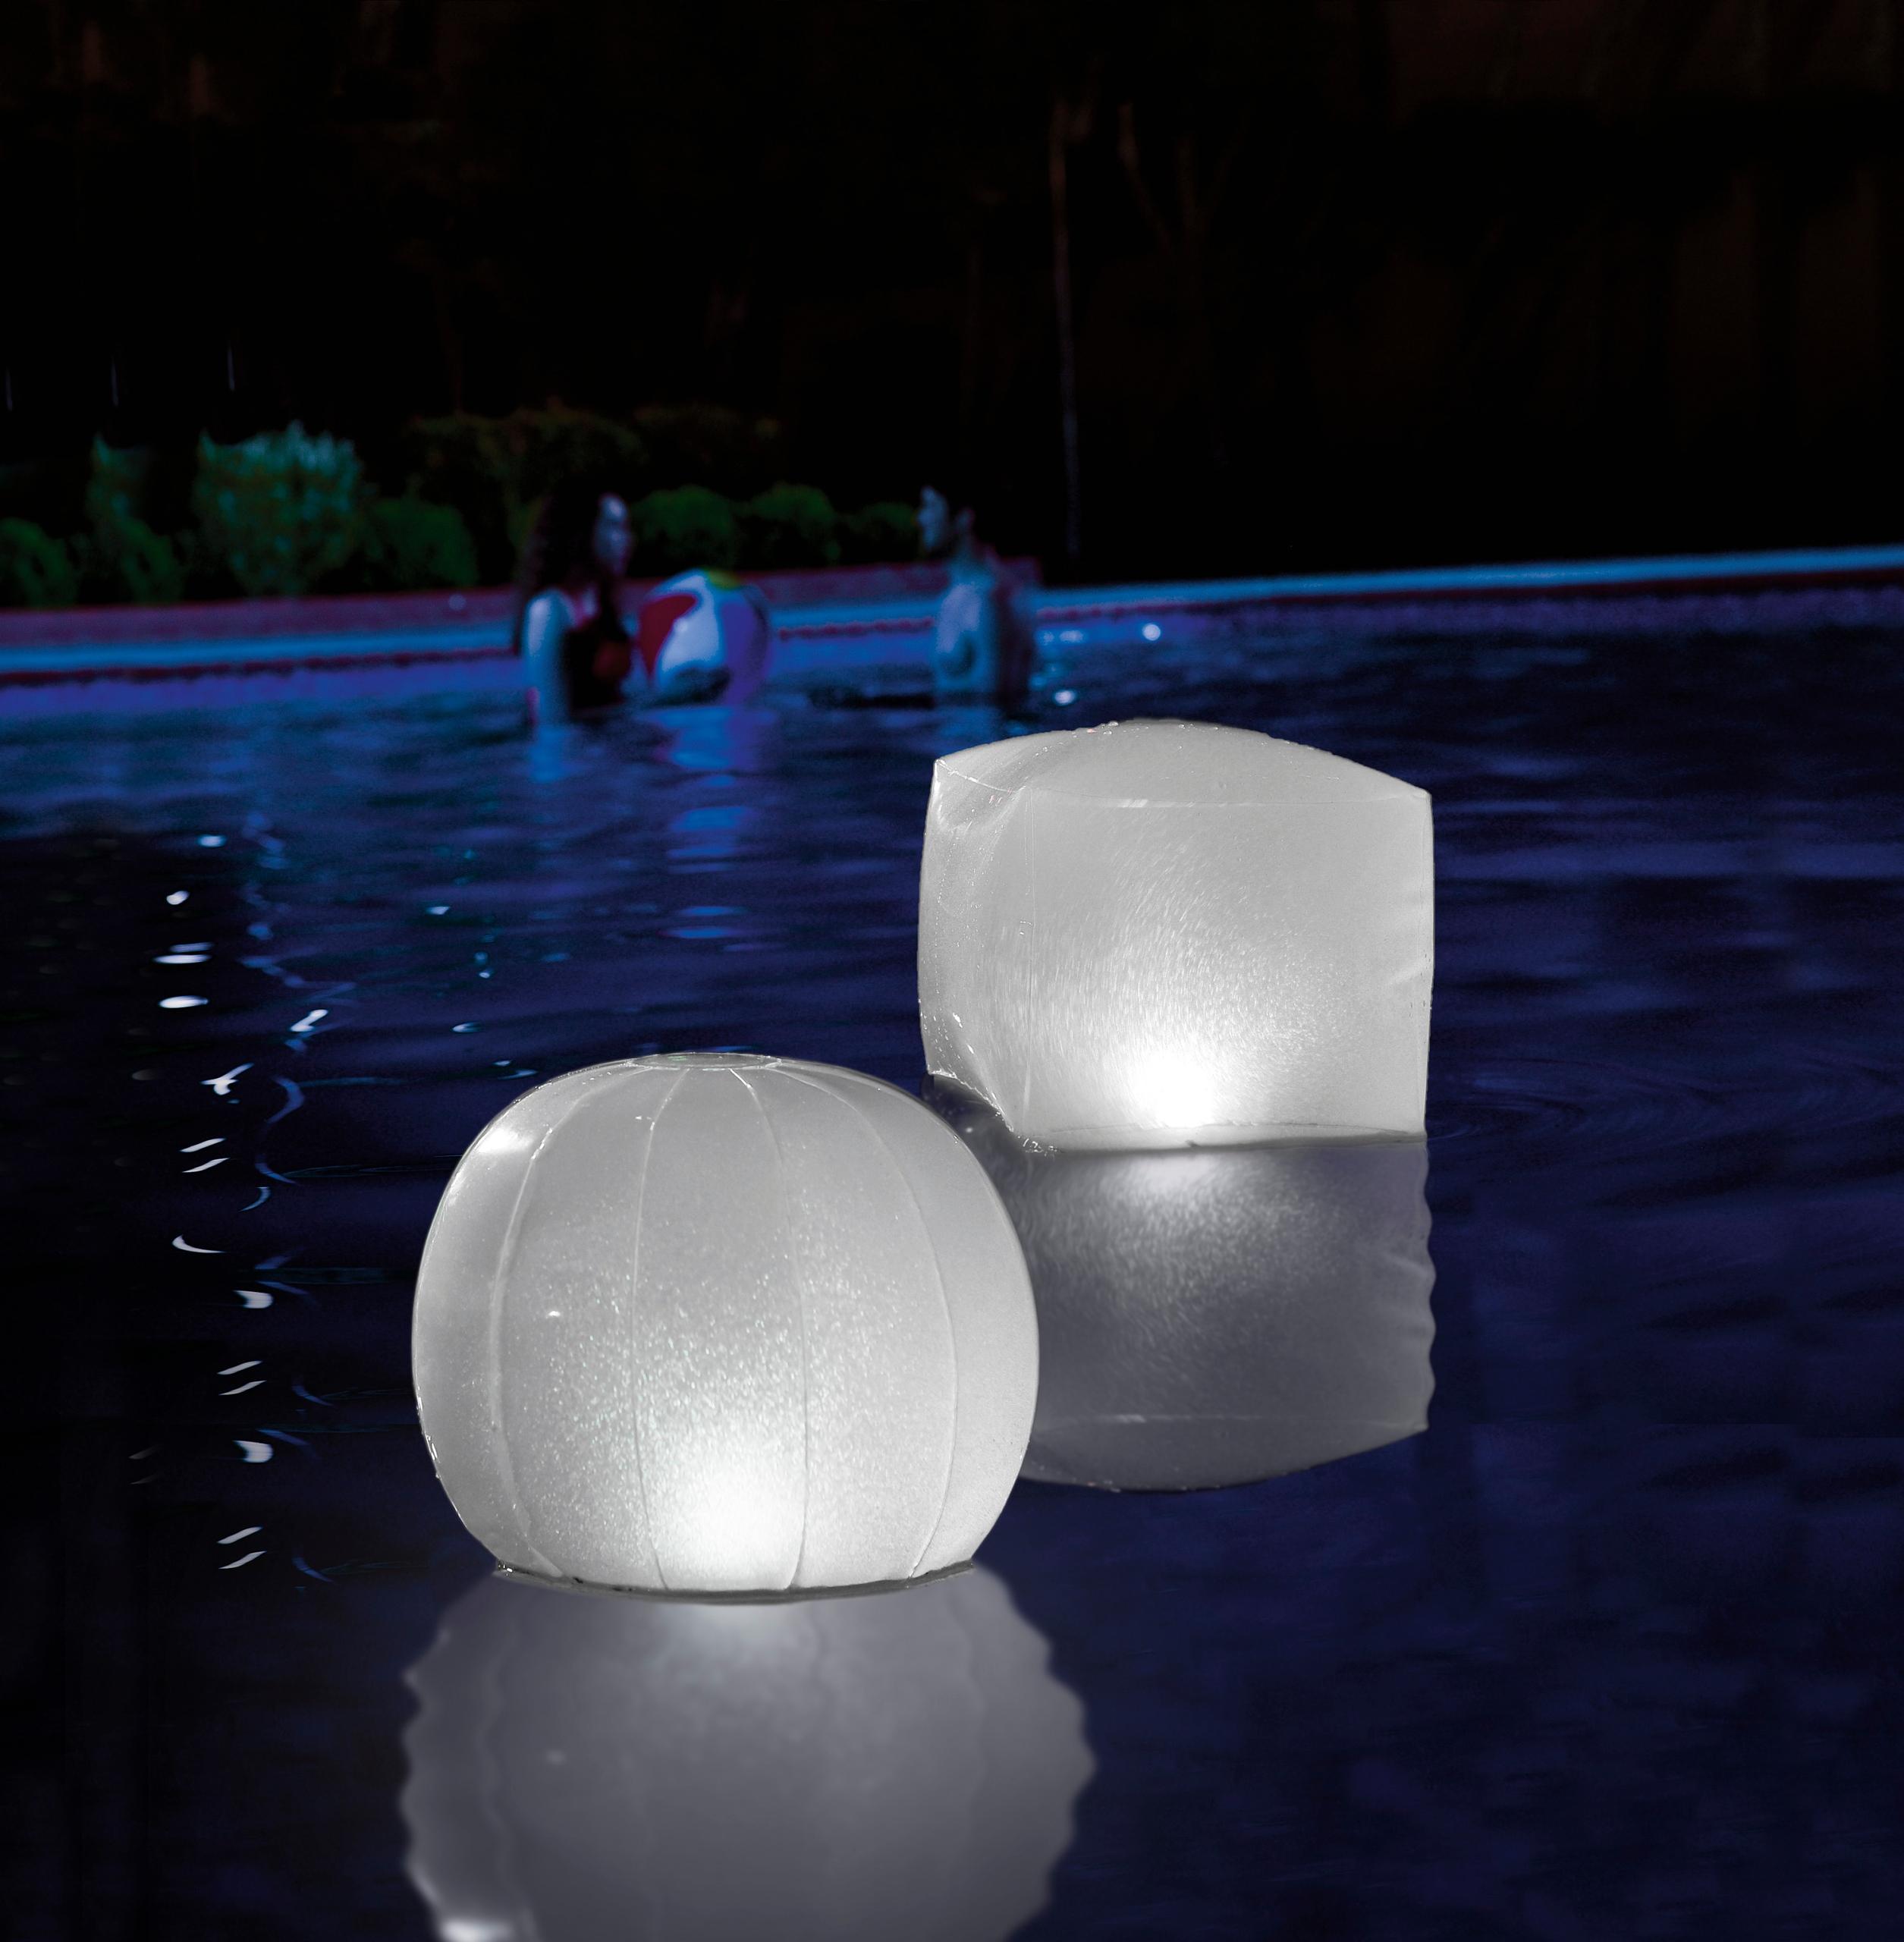 https://c.allegroimg.com/original/03eb75/2e9ed37a404993f574451c17c28c/INTEX-28693-PLYWAJACA-LAMPA-LED-DO-BASENU-KULA-Producent-INTEX